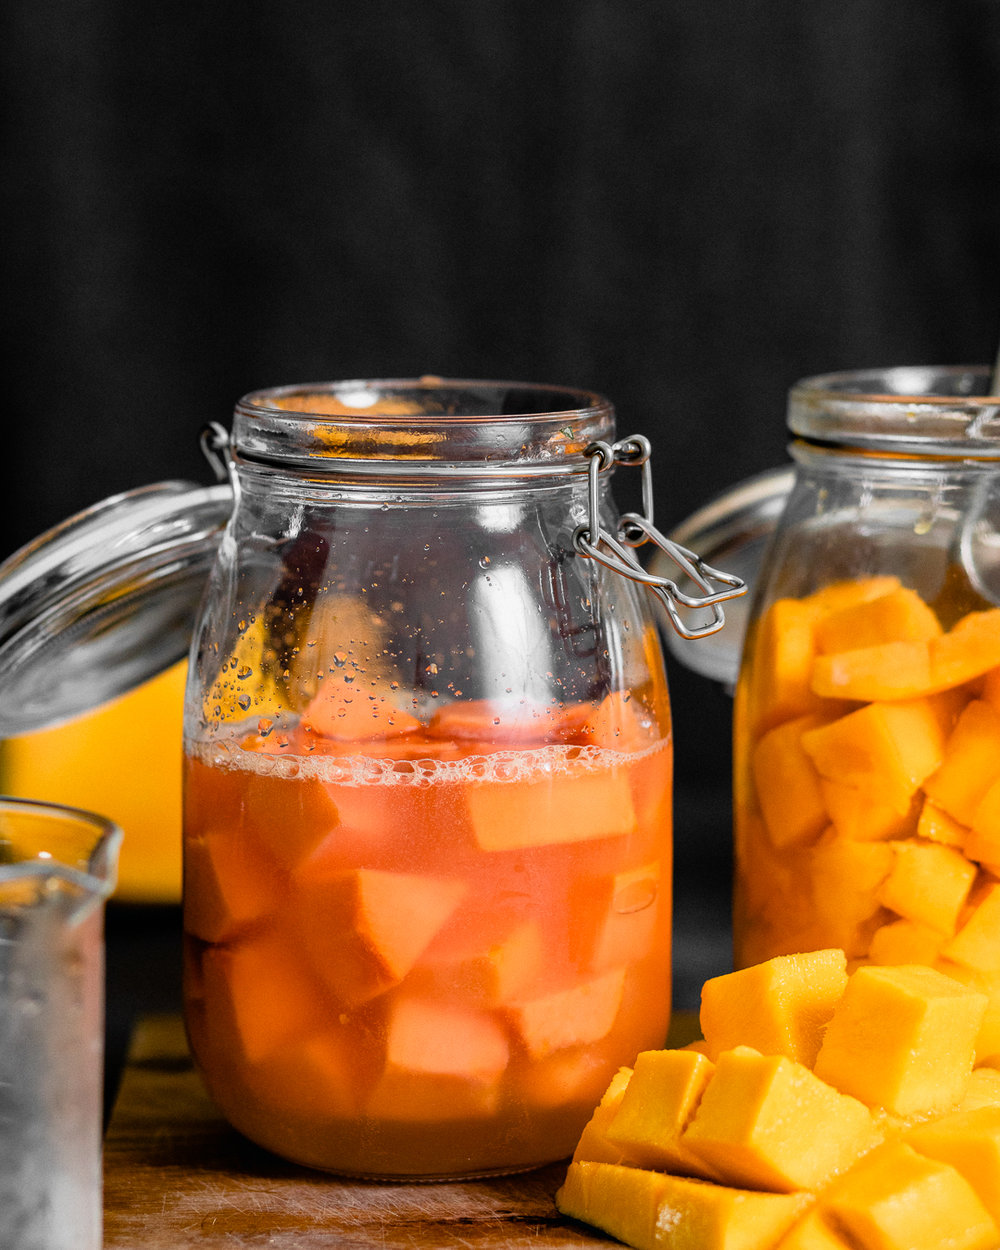 Fermented_Papaya_and_Mango_by_Jordan_Pie_Nutritionist_Photographer-4.jpg